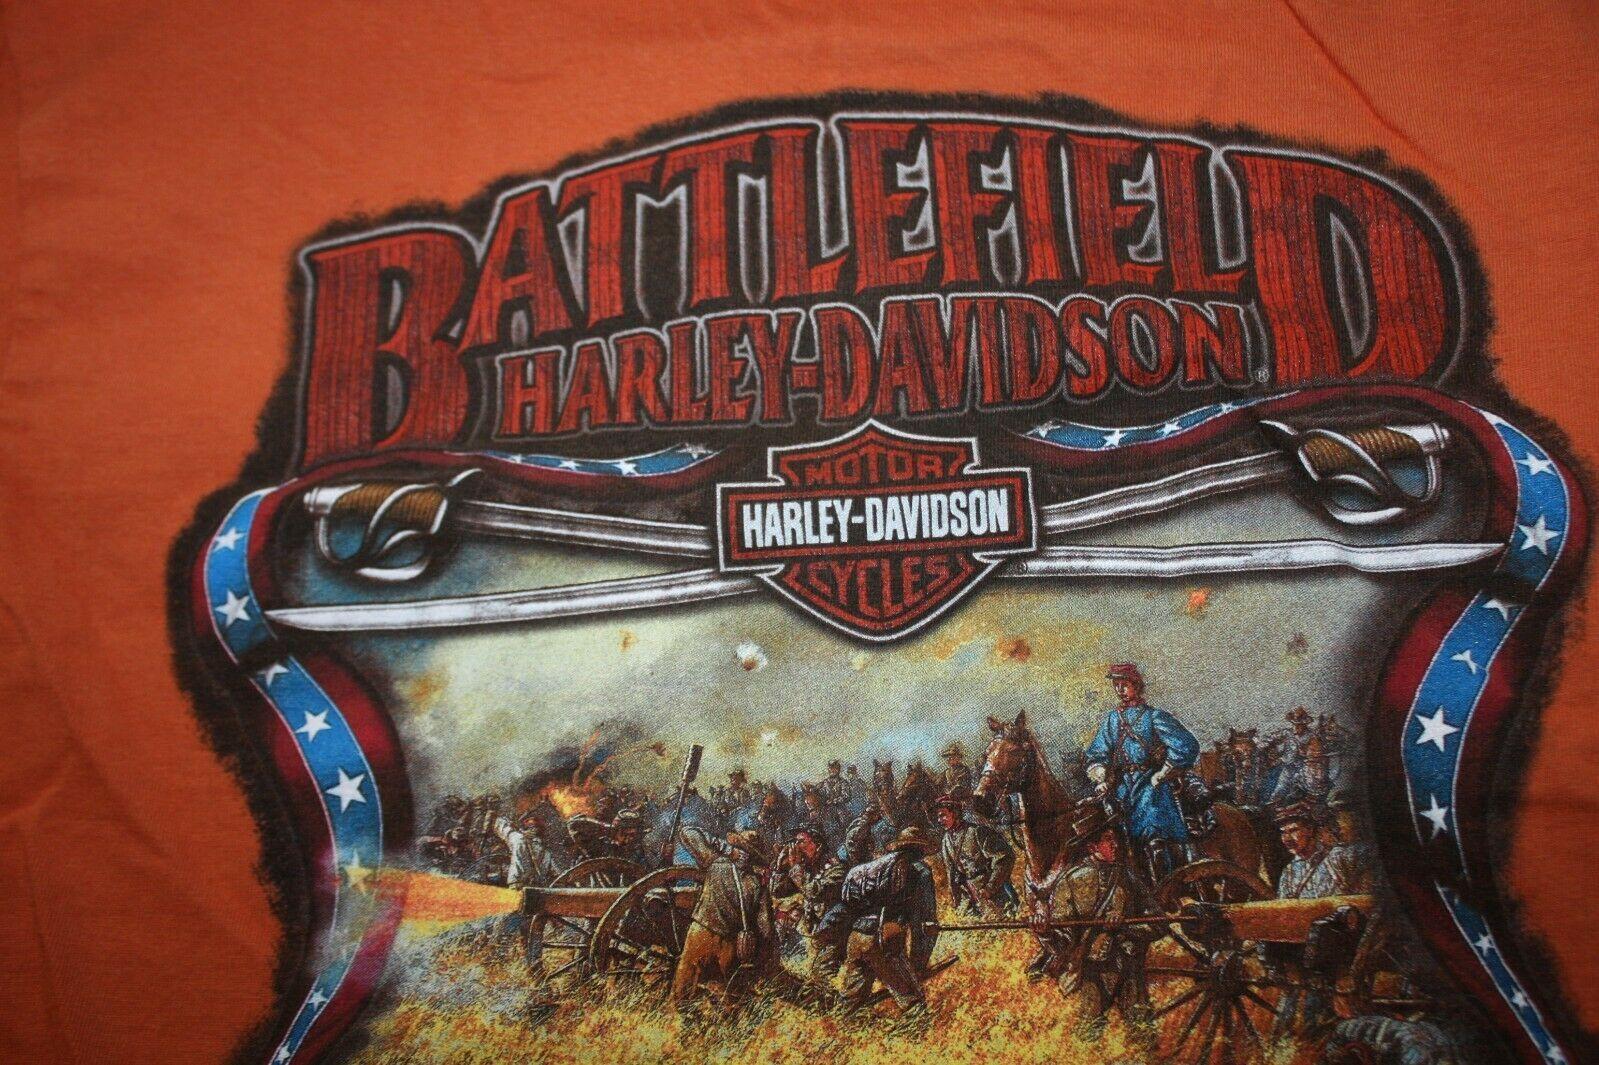 Harley Davidson Mens T-Shirt Orange Battlefield Harley Gettysburgh PA Size Small image 5